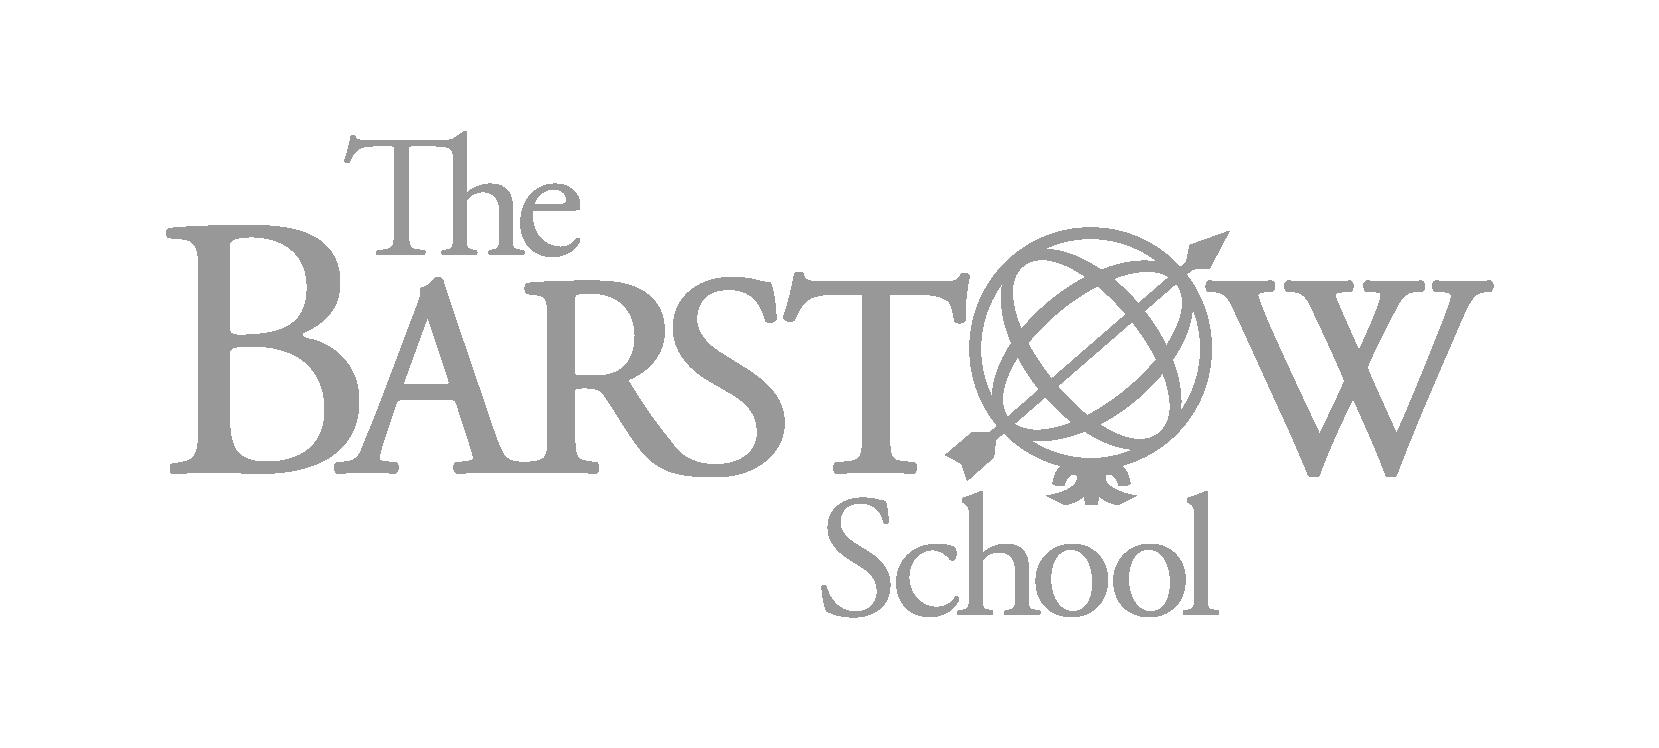 Barstow logo Crux website